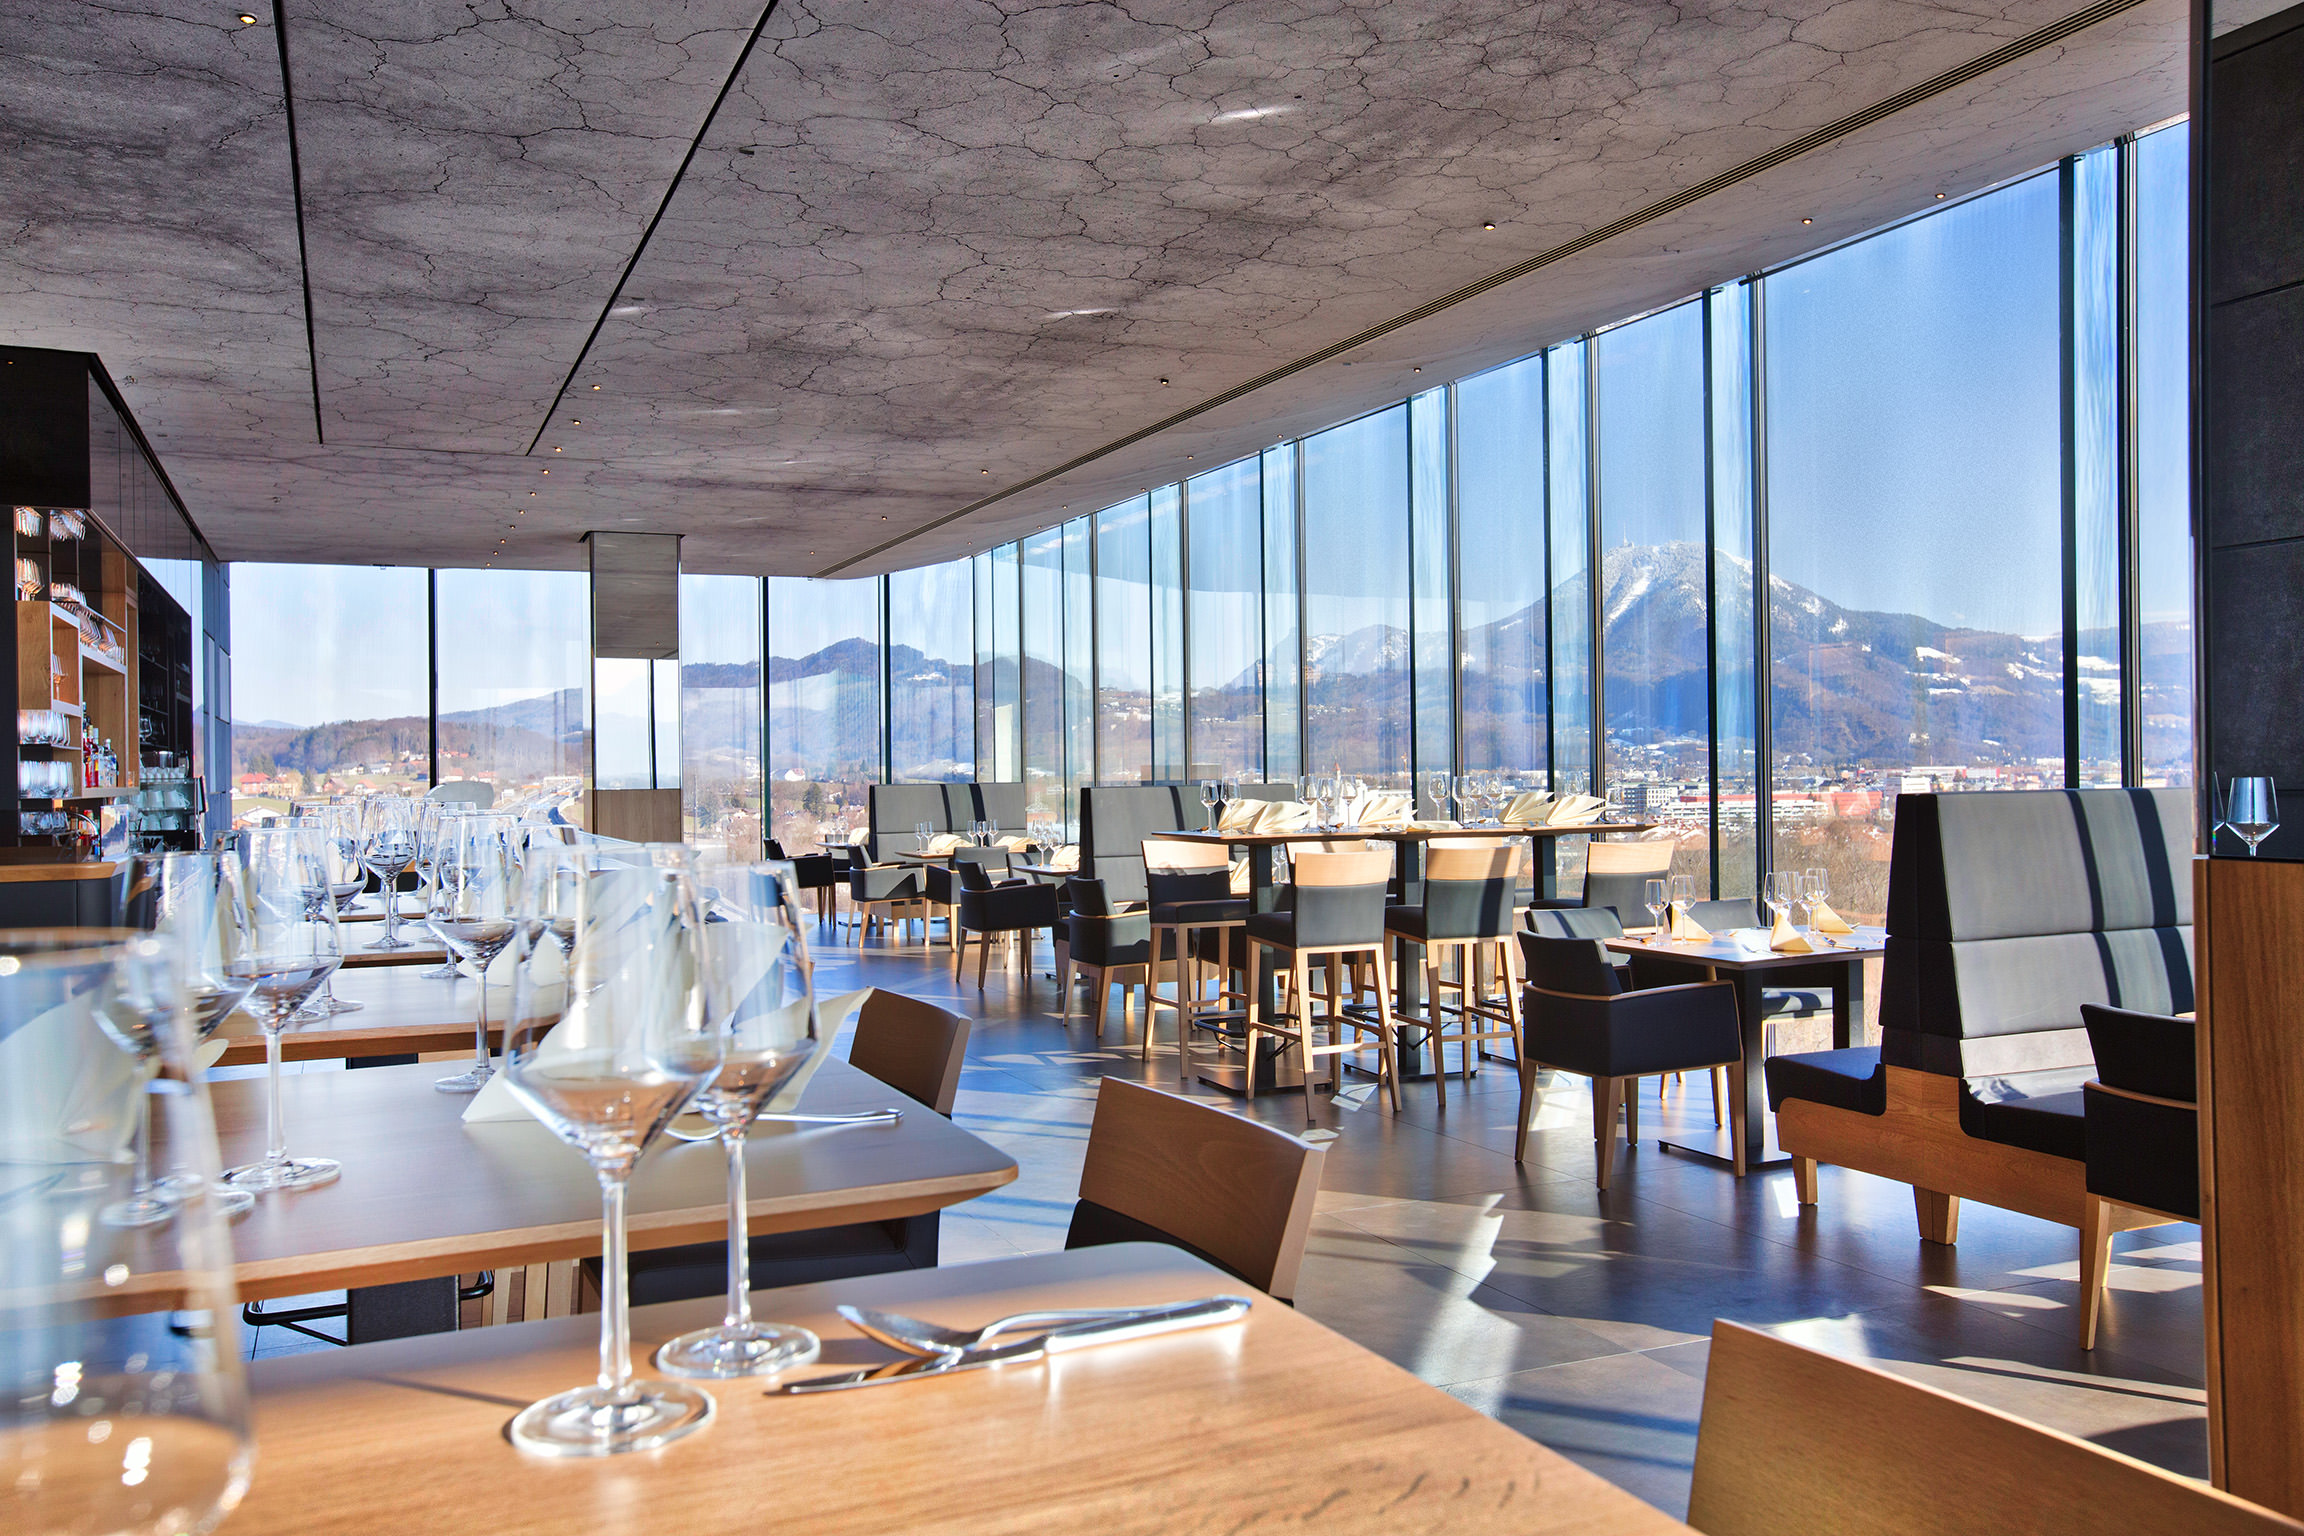 Rooftop Terrace Hotel With  Restaurants